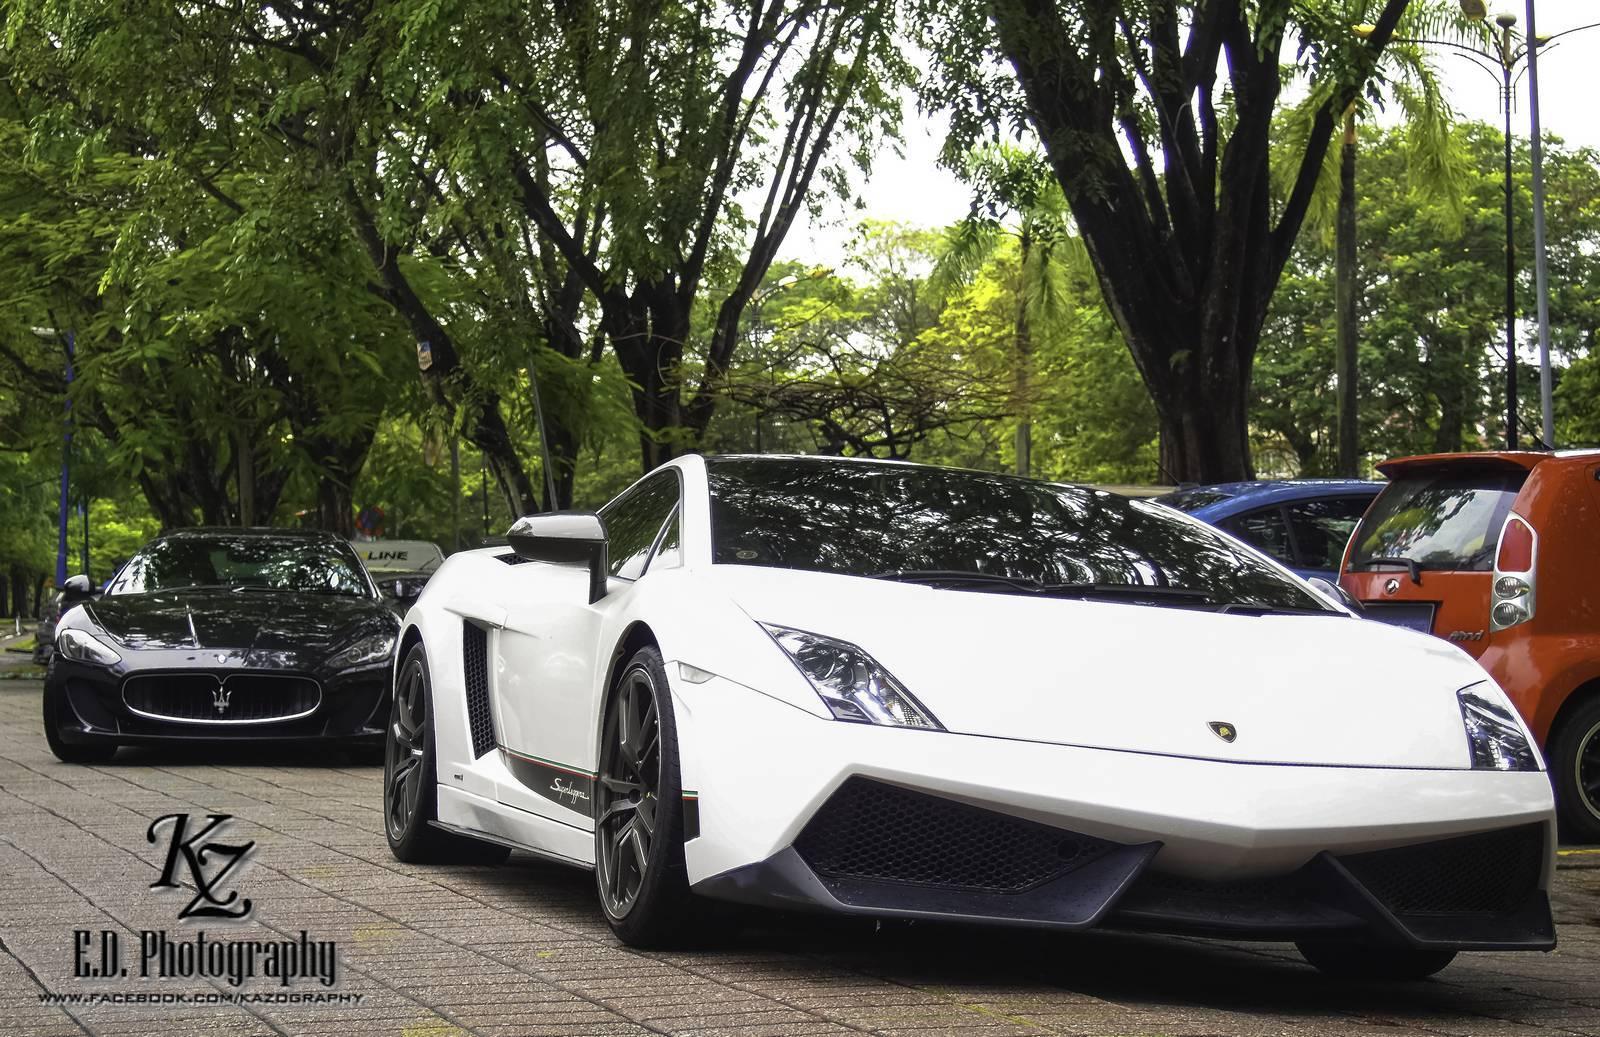 Gallery: Blue Jackets Society Supercar Charity Drive Malaysia ...